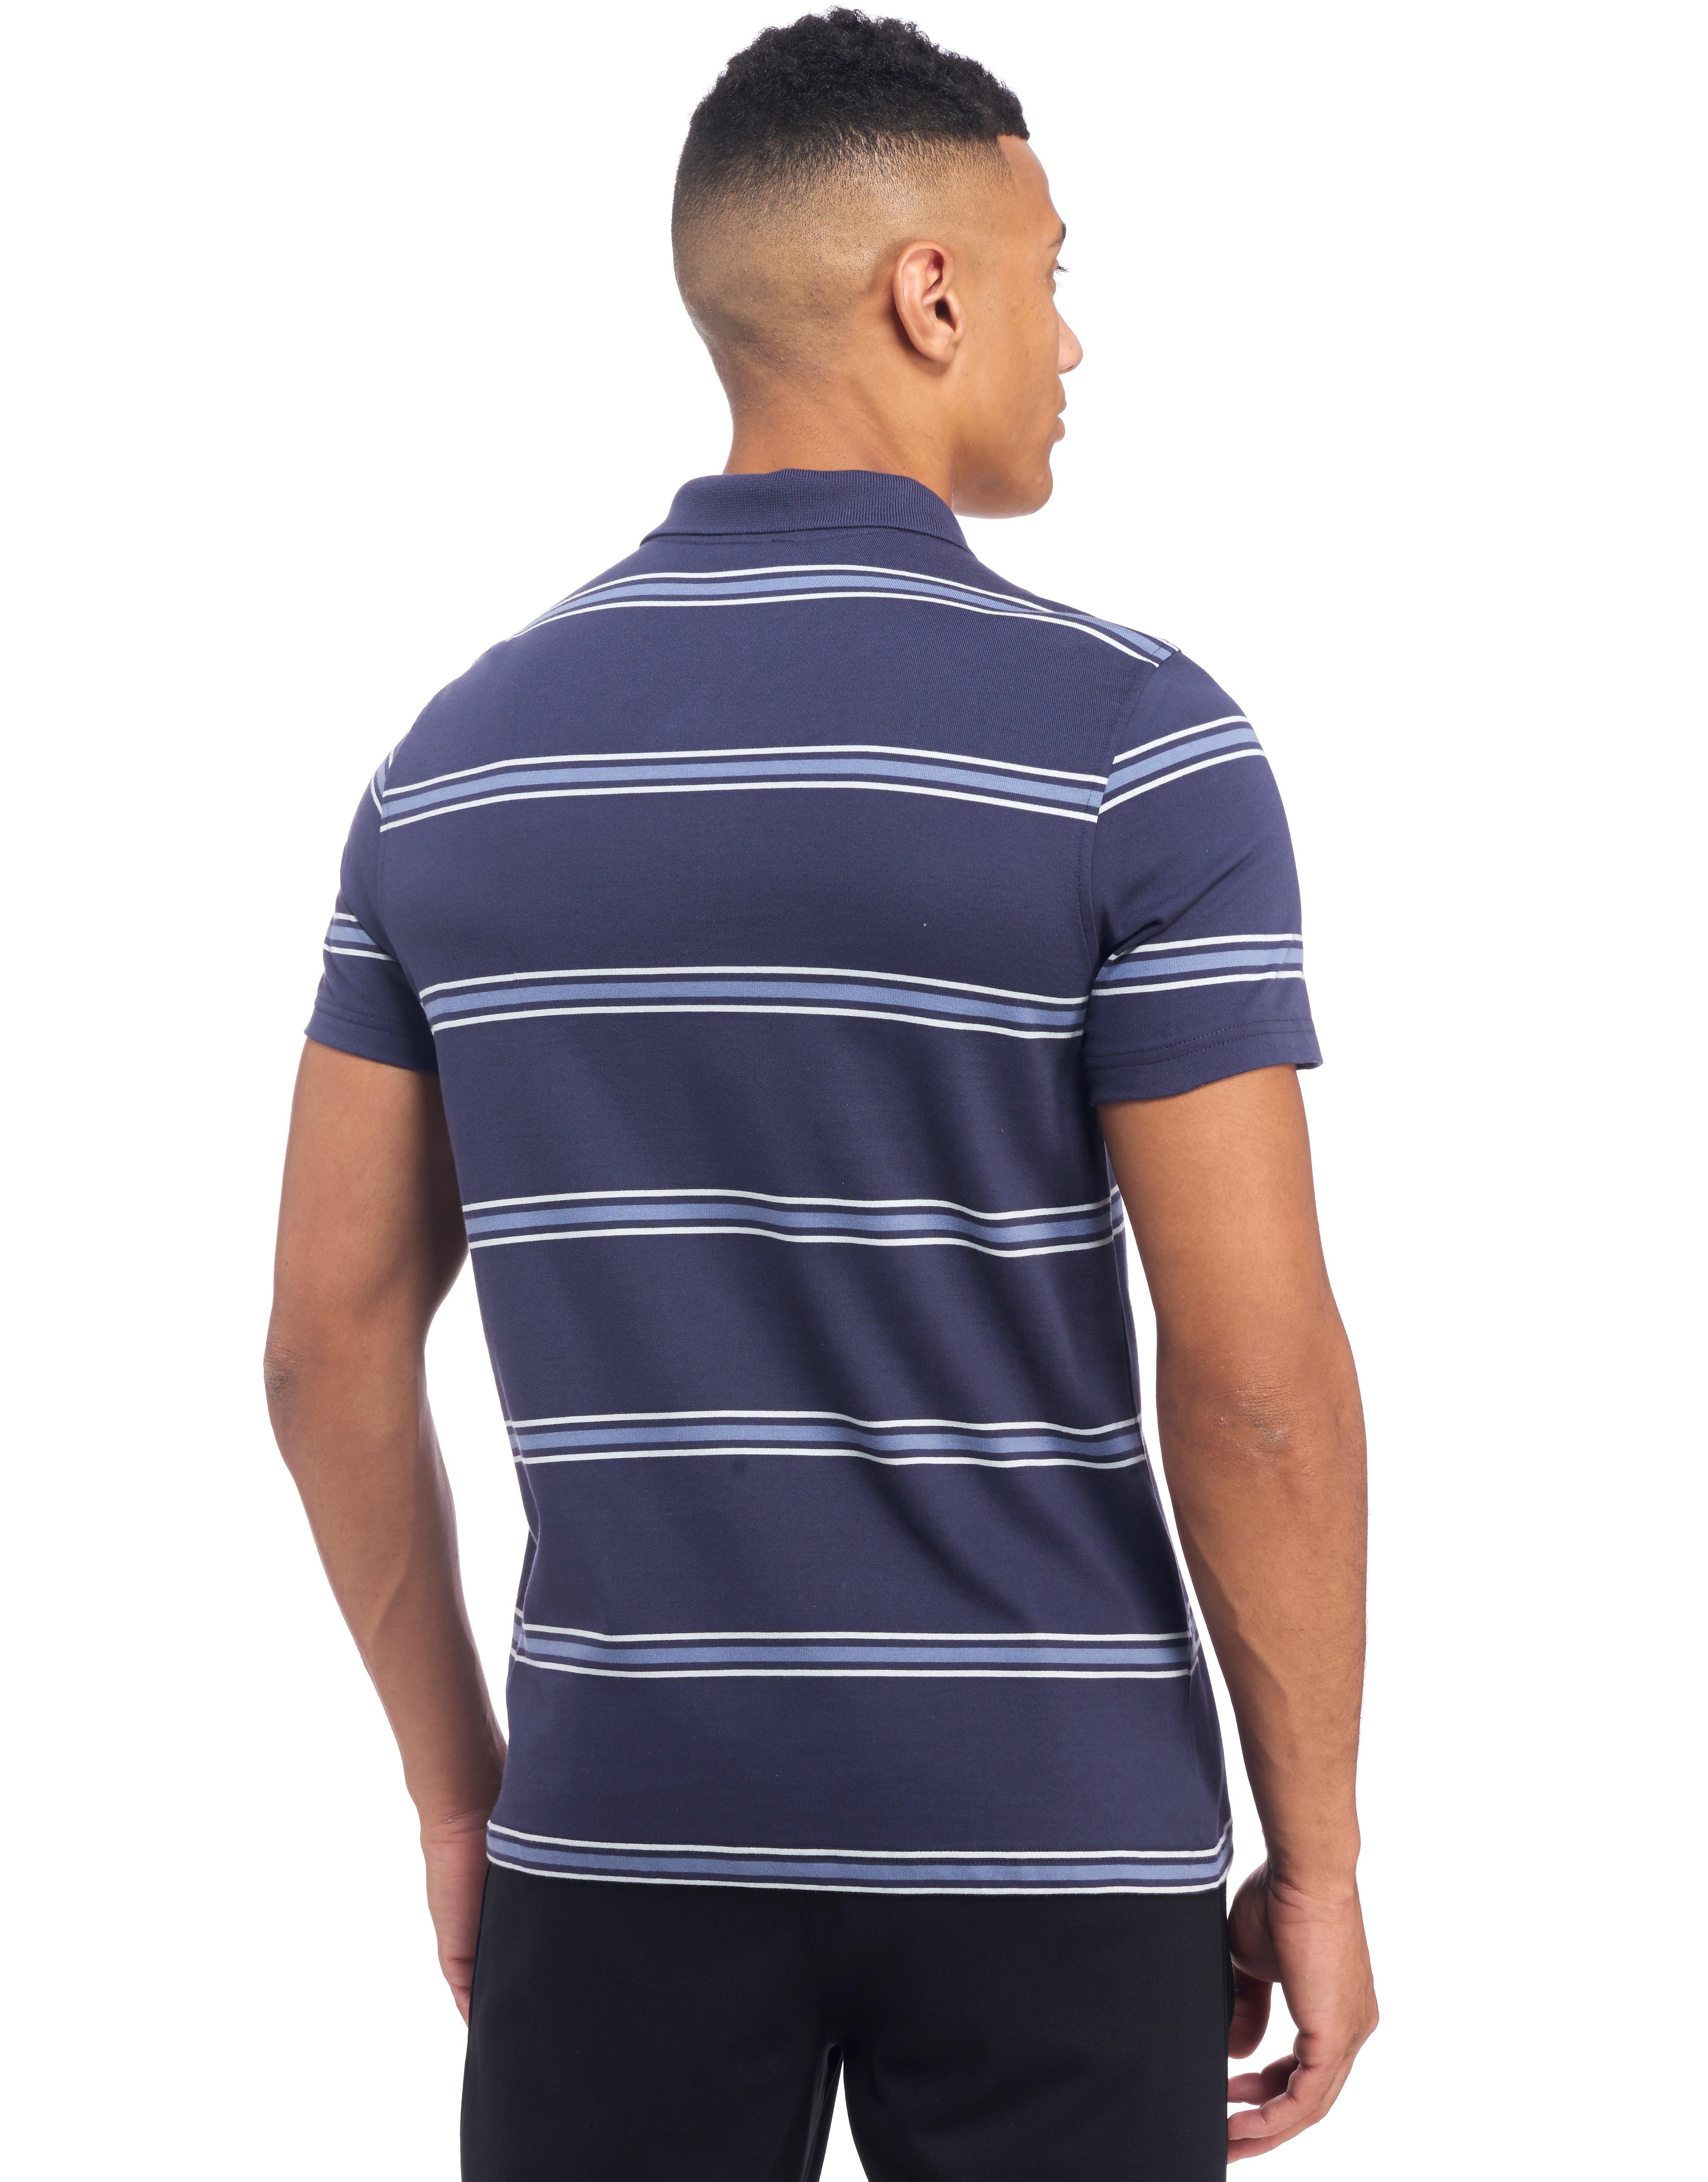 Canterbury England RFU Stripe Polo Shirt